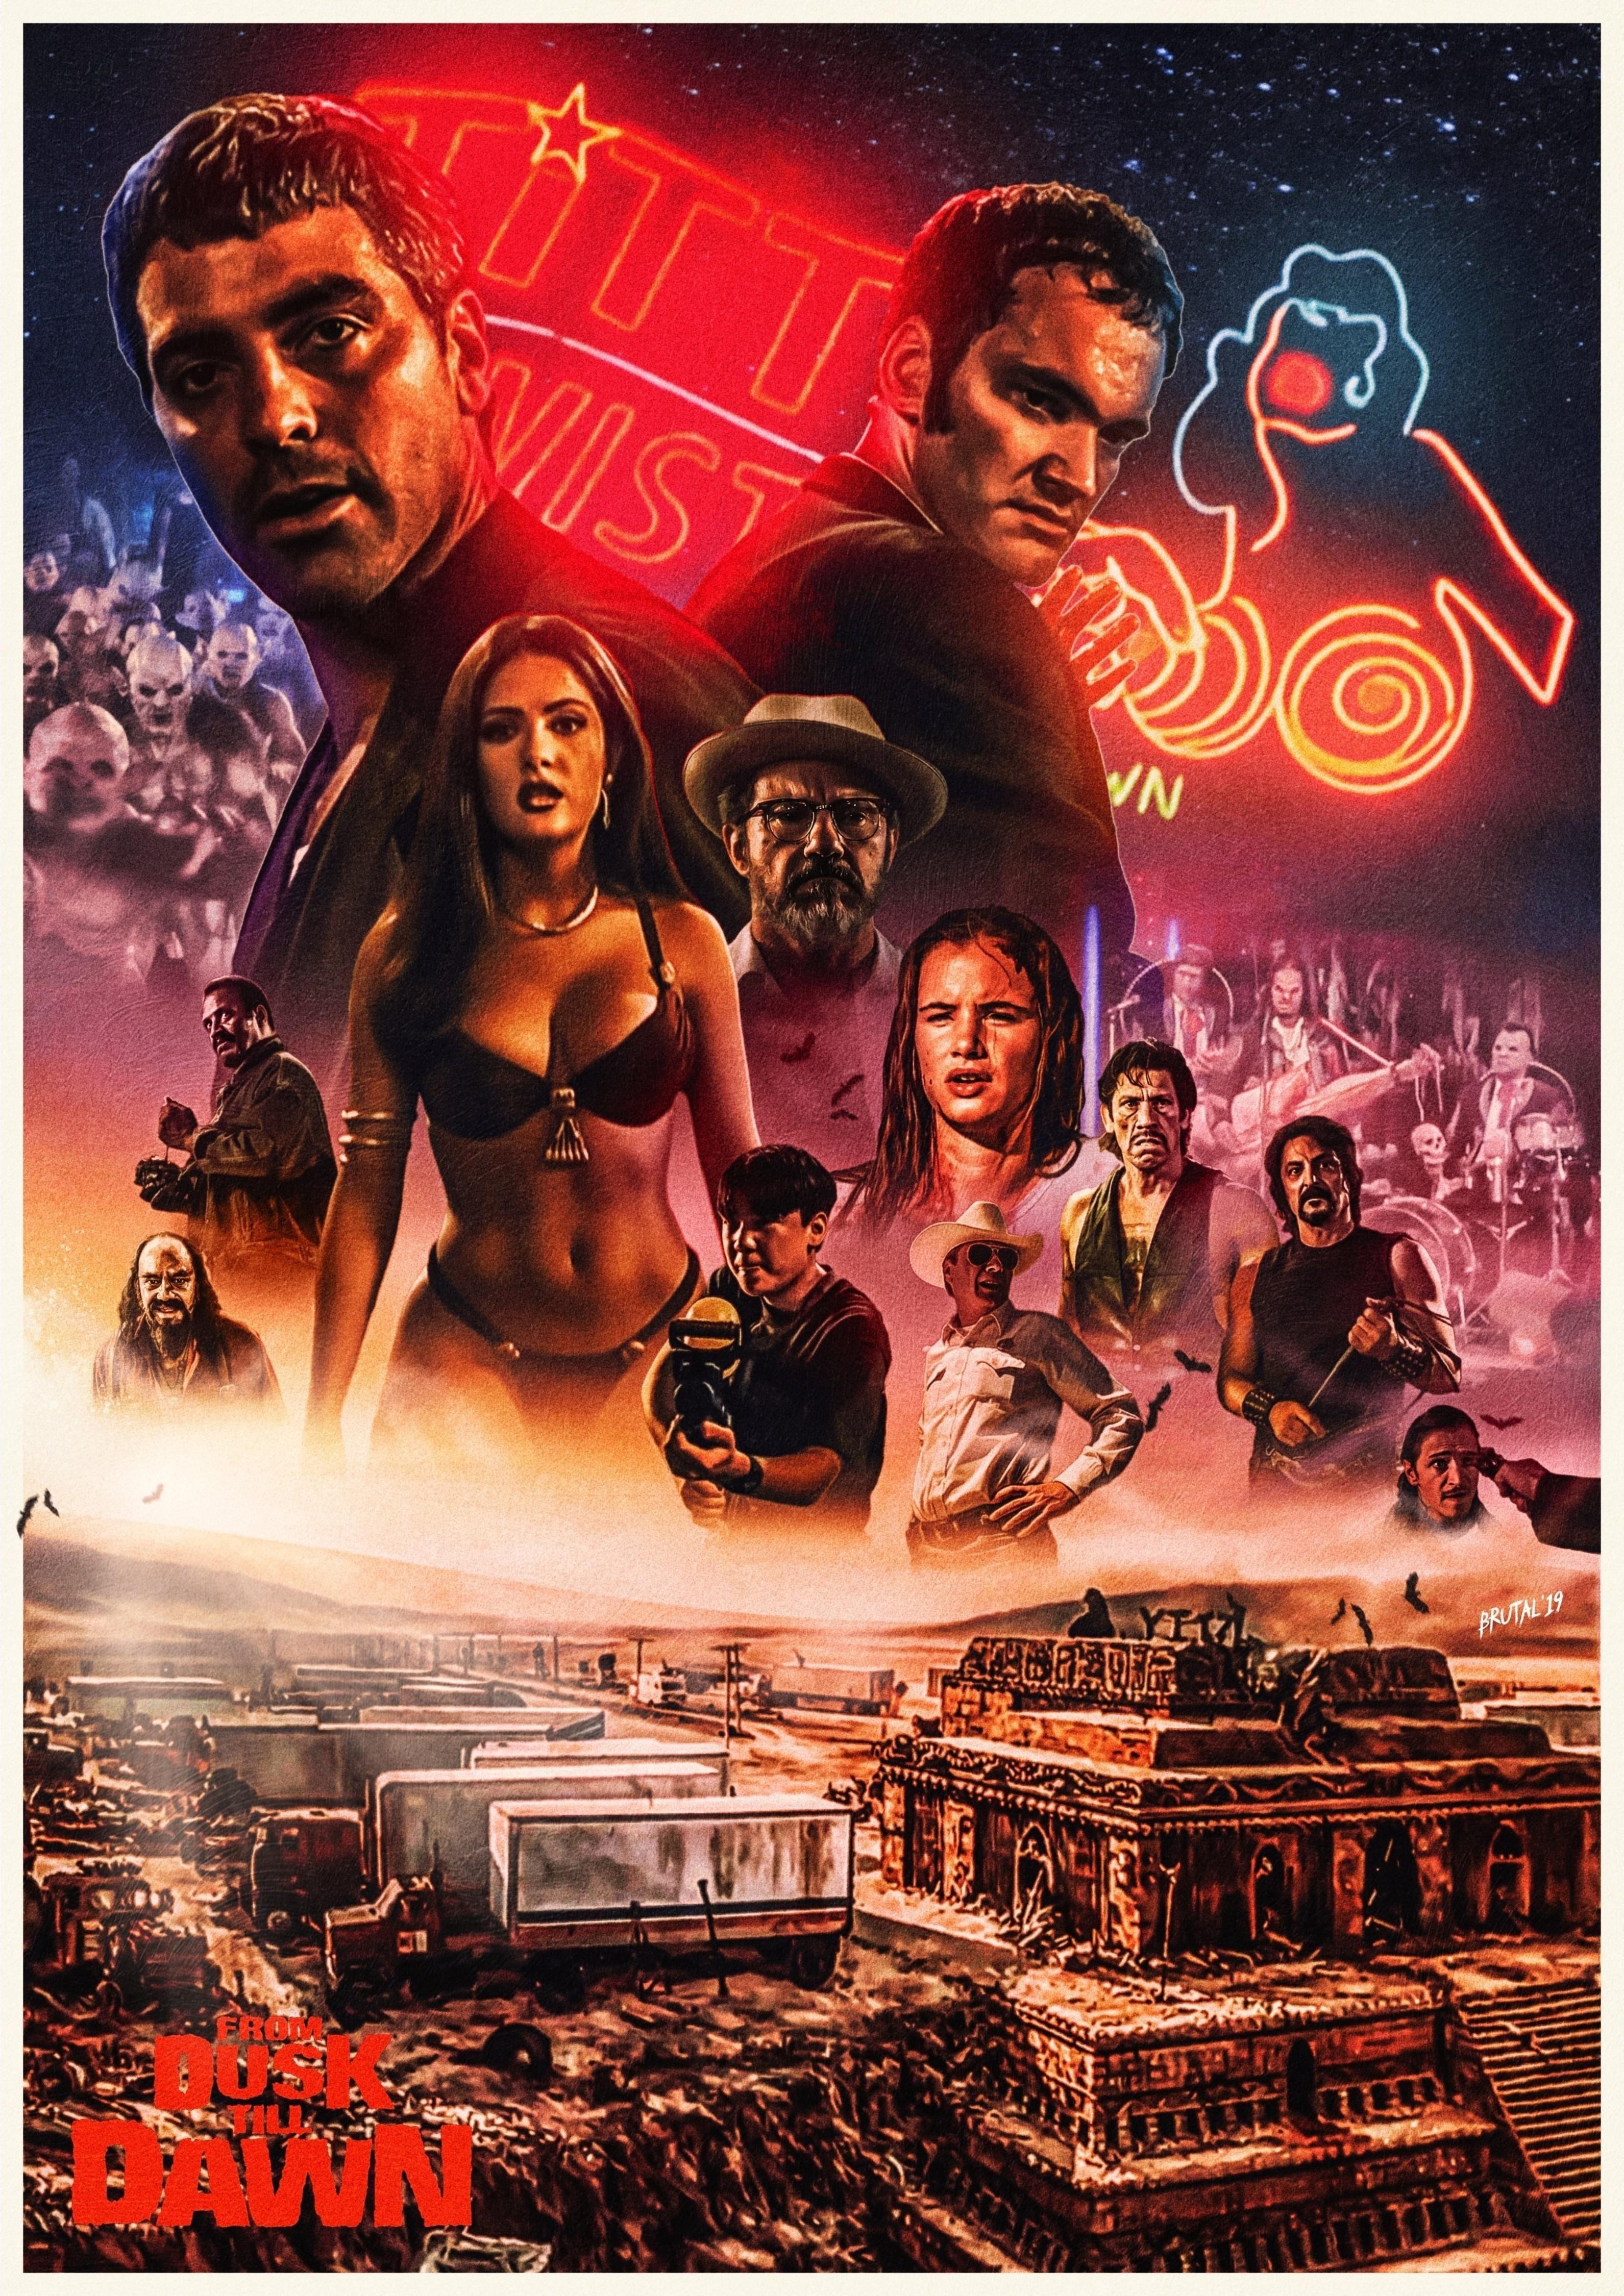 From Dusk Till Dawn 1996 3182 4500 By Chris Barnes Film Posters Art Dawn Movie Dusk Till Dawn